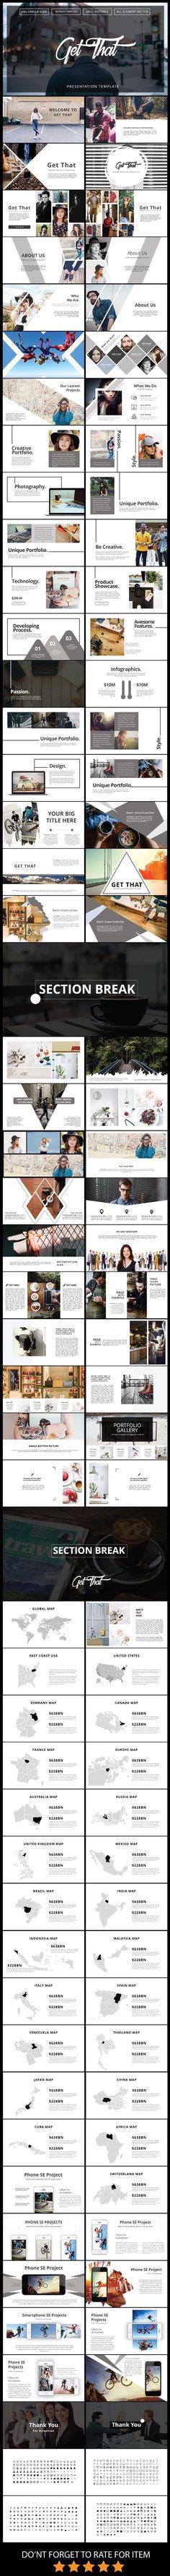 tes 2 Get That Multipurpose PowerPoint Presentation Template ds Portfolio Design, Book Portfolio, Layout Print, Layout Design, Webdesign Inspiration, Graphic Design Inspiration, Mise En Page Web, Keynote Design, Design Presentation